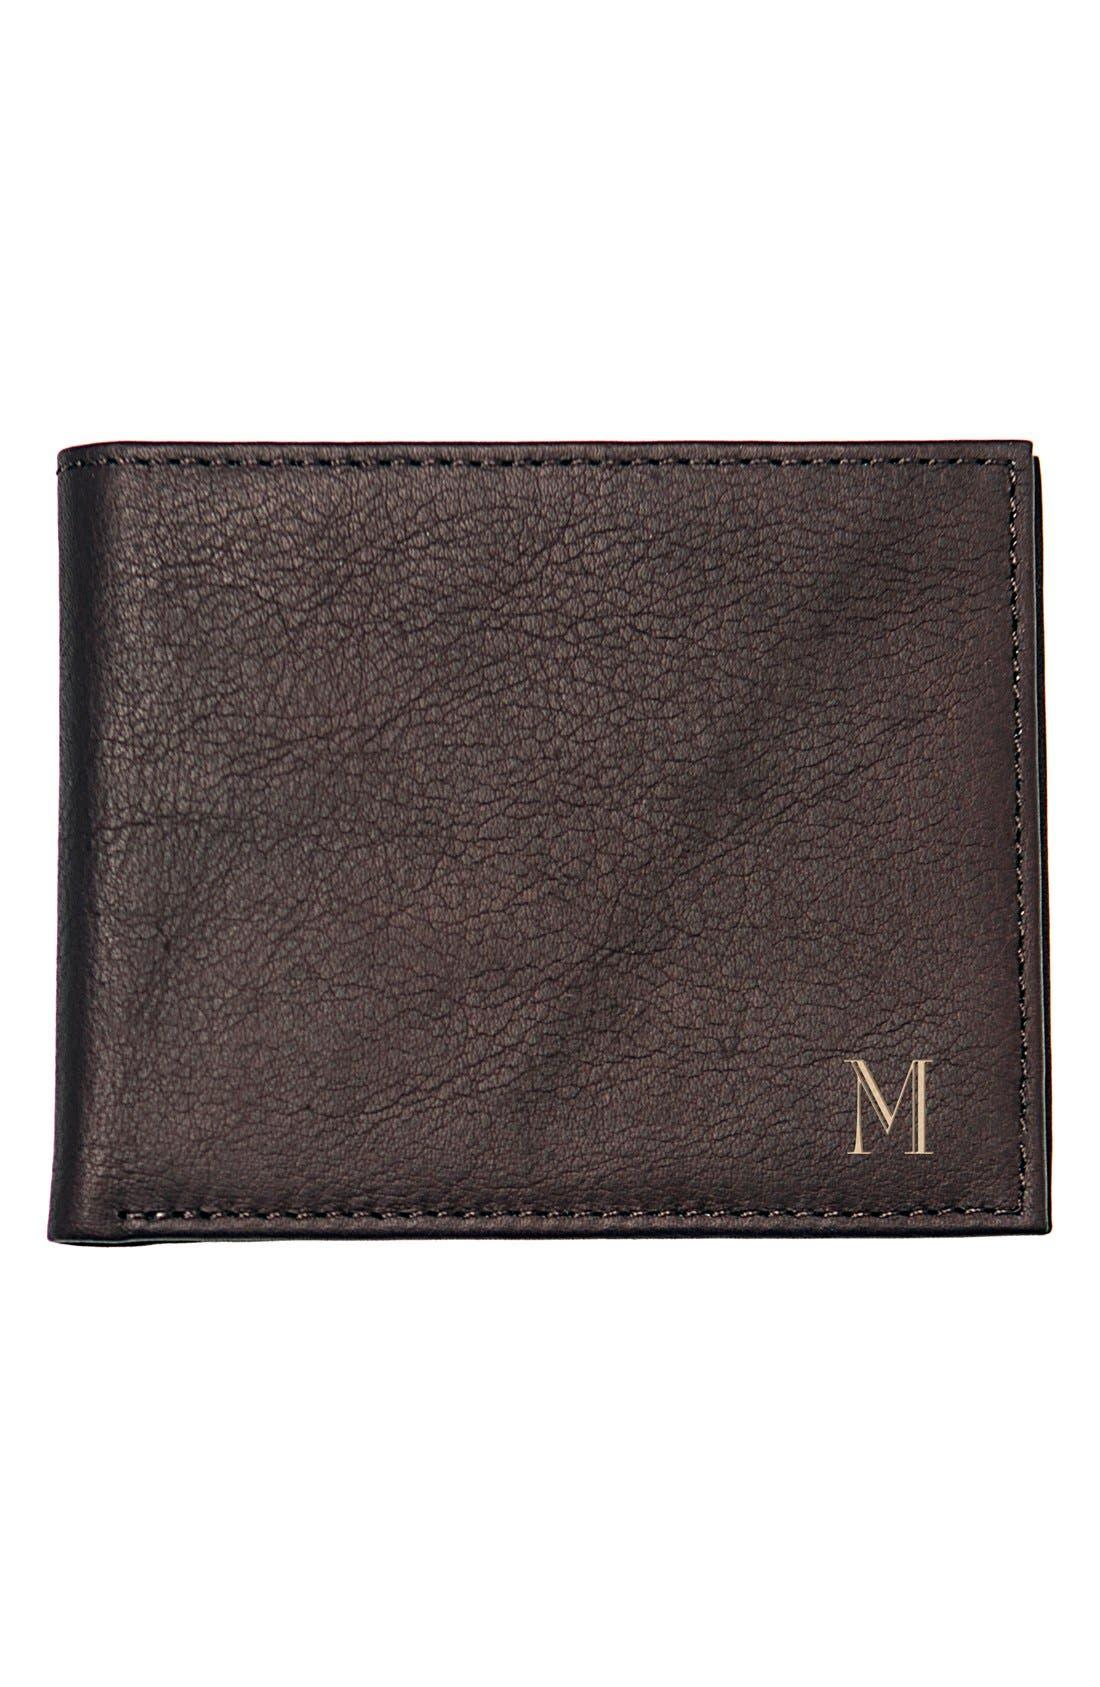 Monogram Bifold Wallet,                         Main,                         color, Brown - M